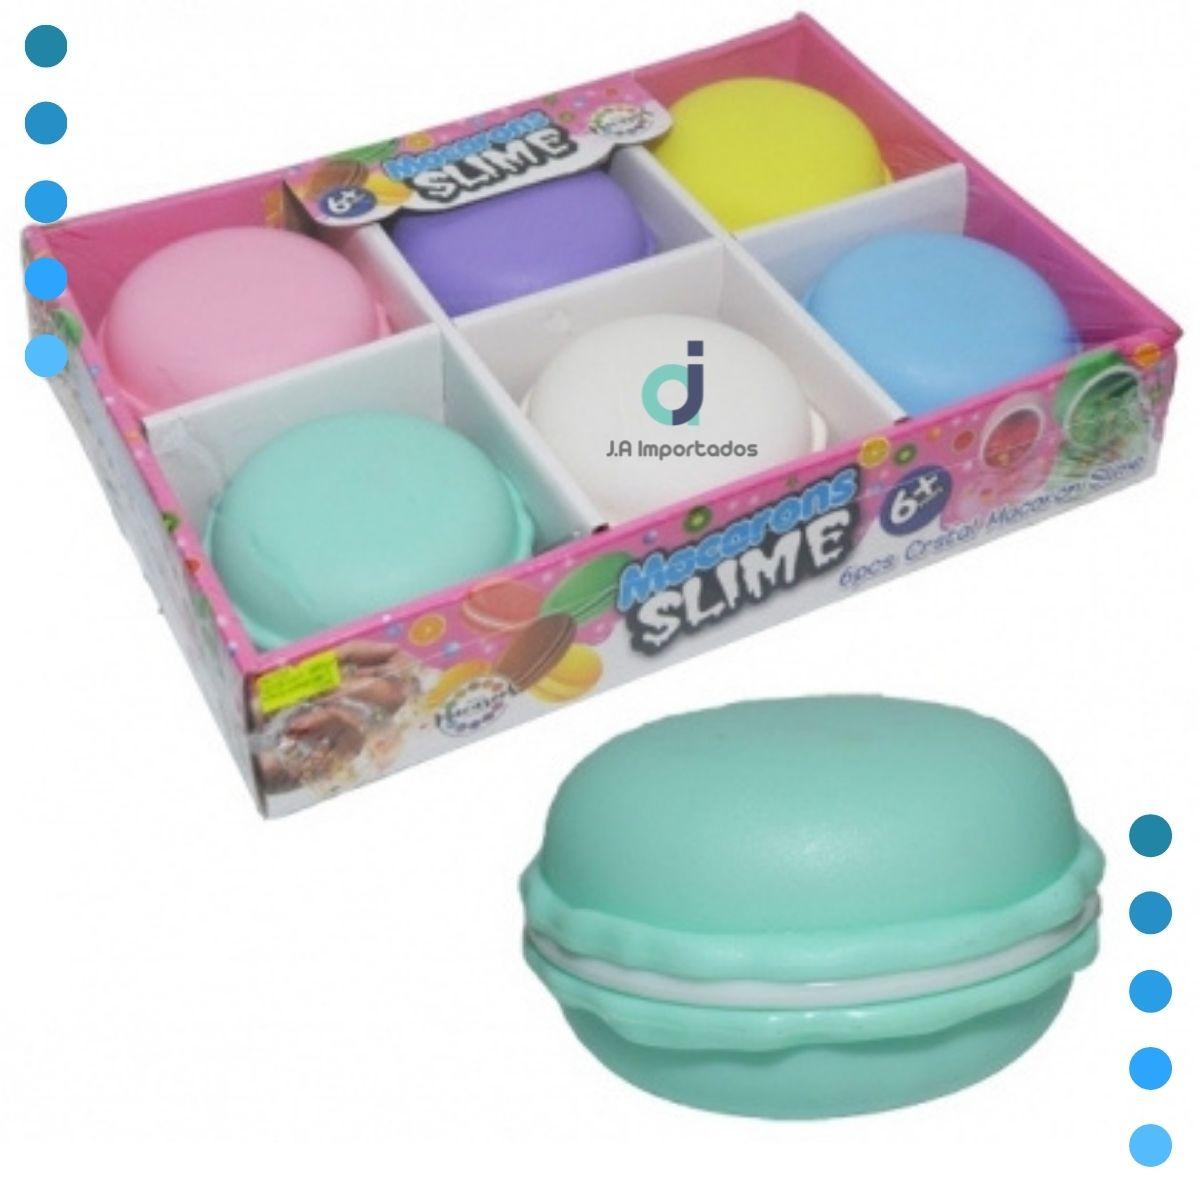 Kit Anti Estresse 06 Slime Geleia Massinha Perfumado